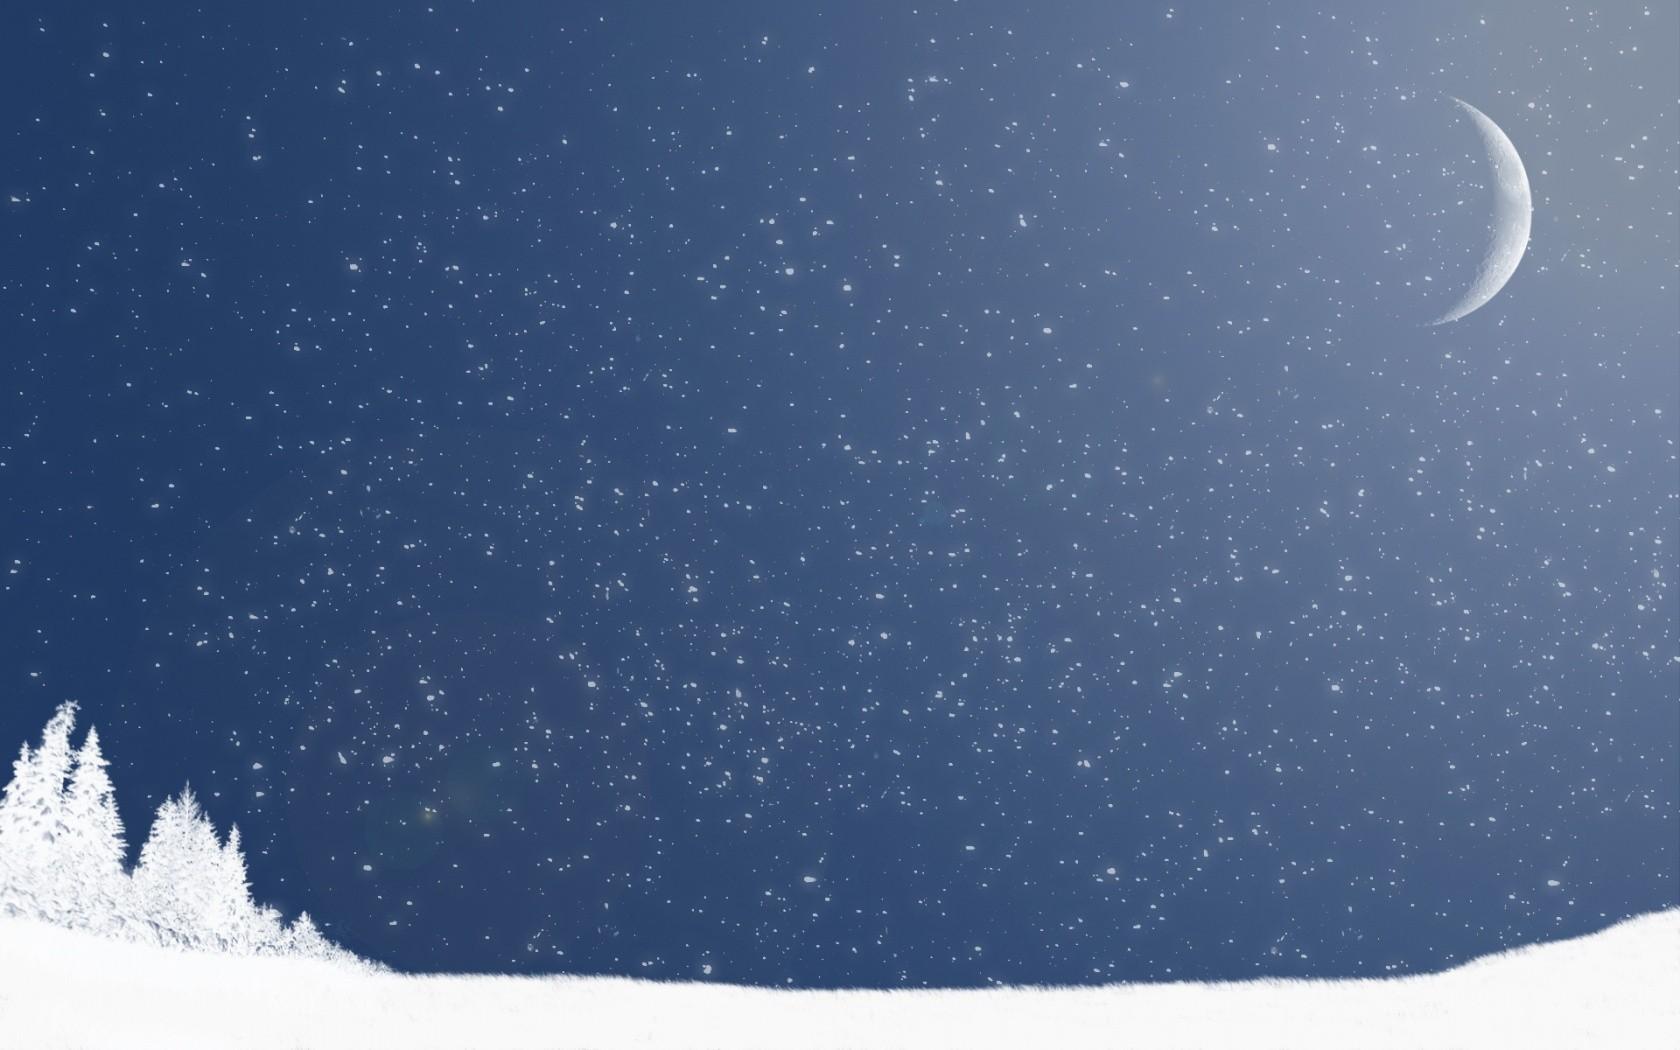 Winter Night Wallpaper 1680x1050 Winter Night Moon Artwork 1680x1050